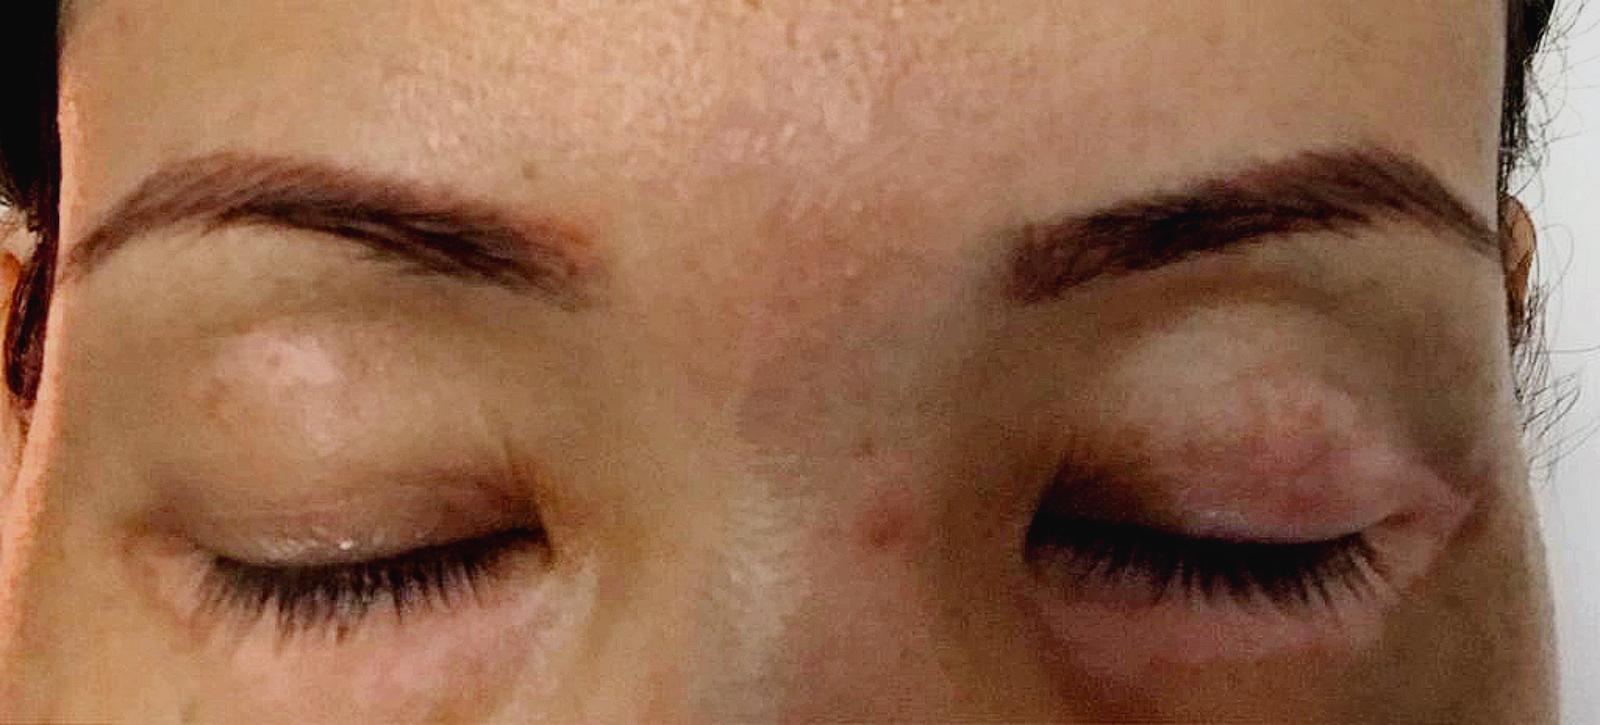 vitiligo before